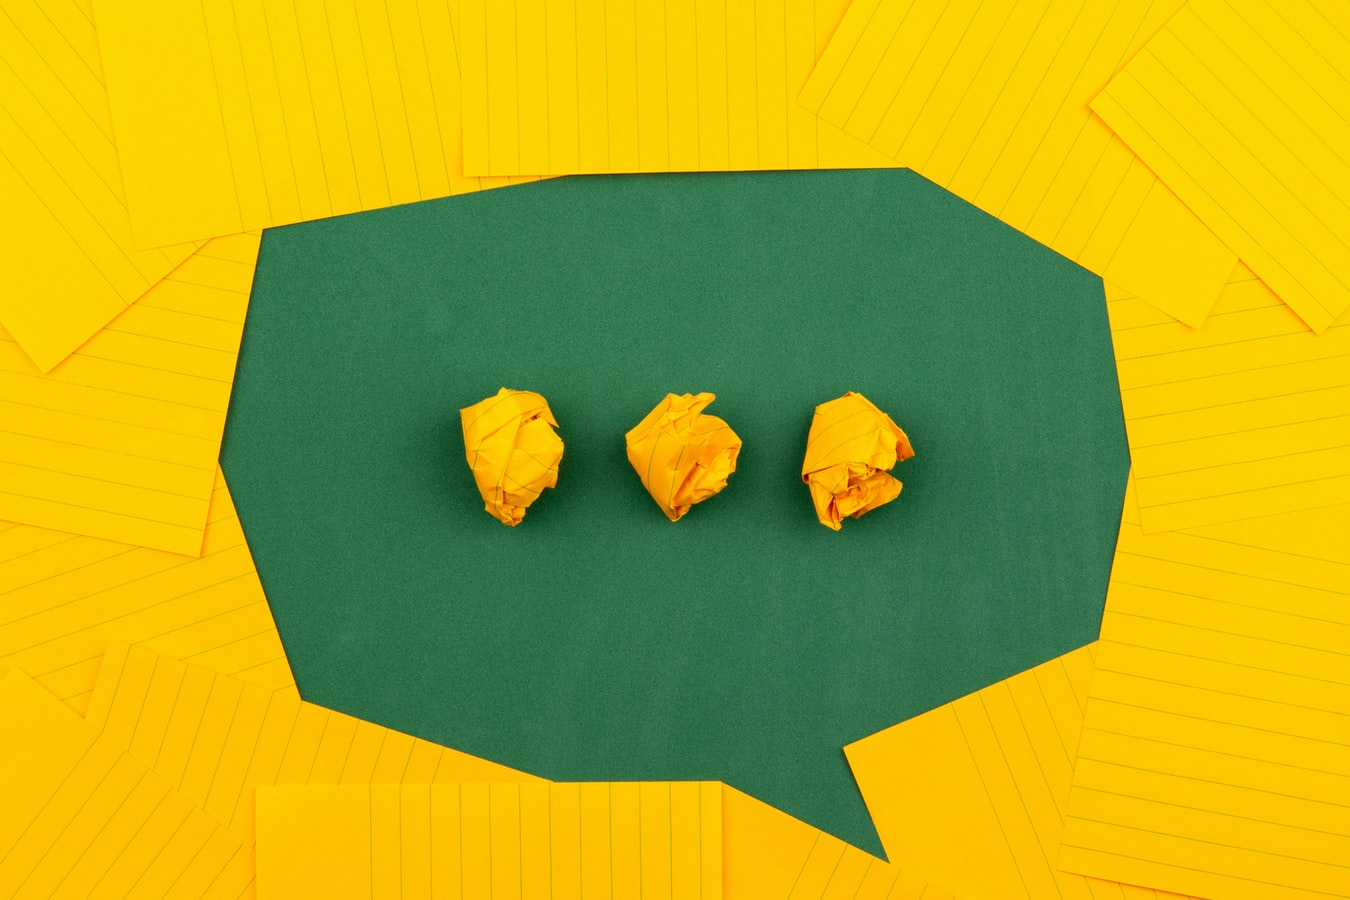 Speak Dialogue